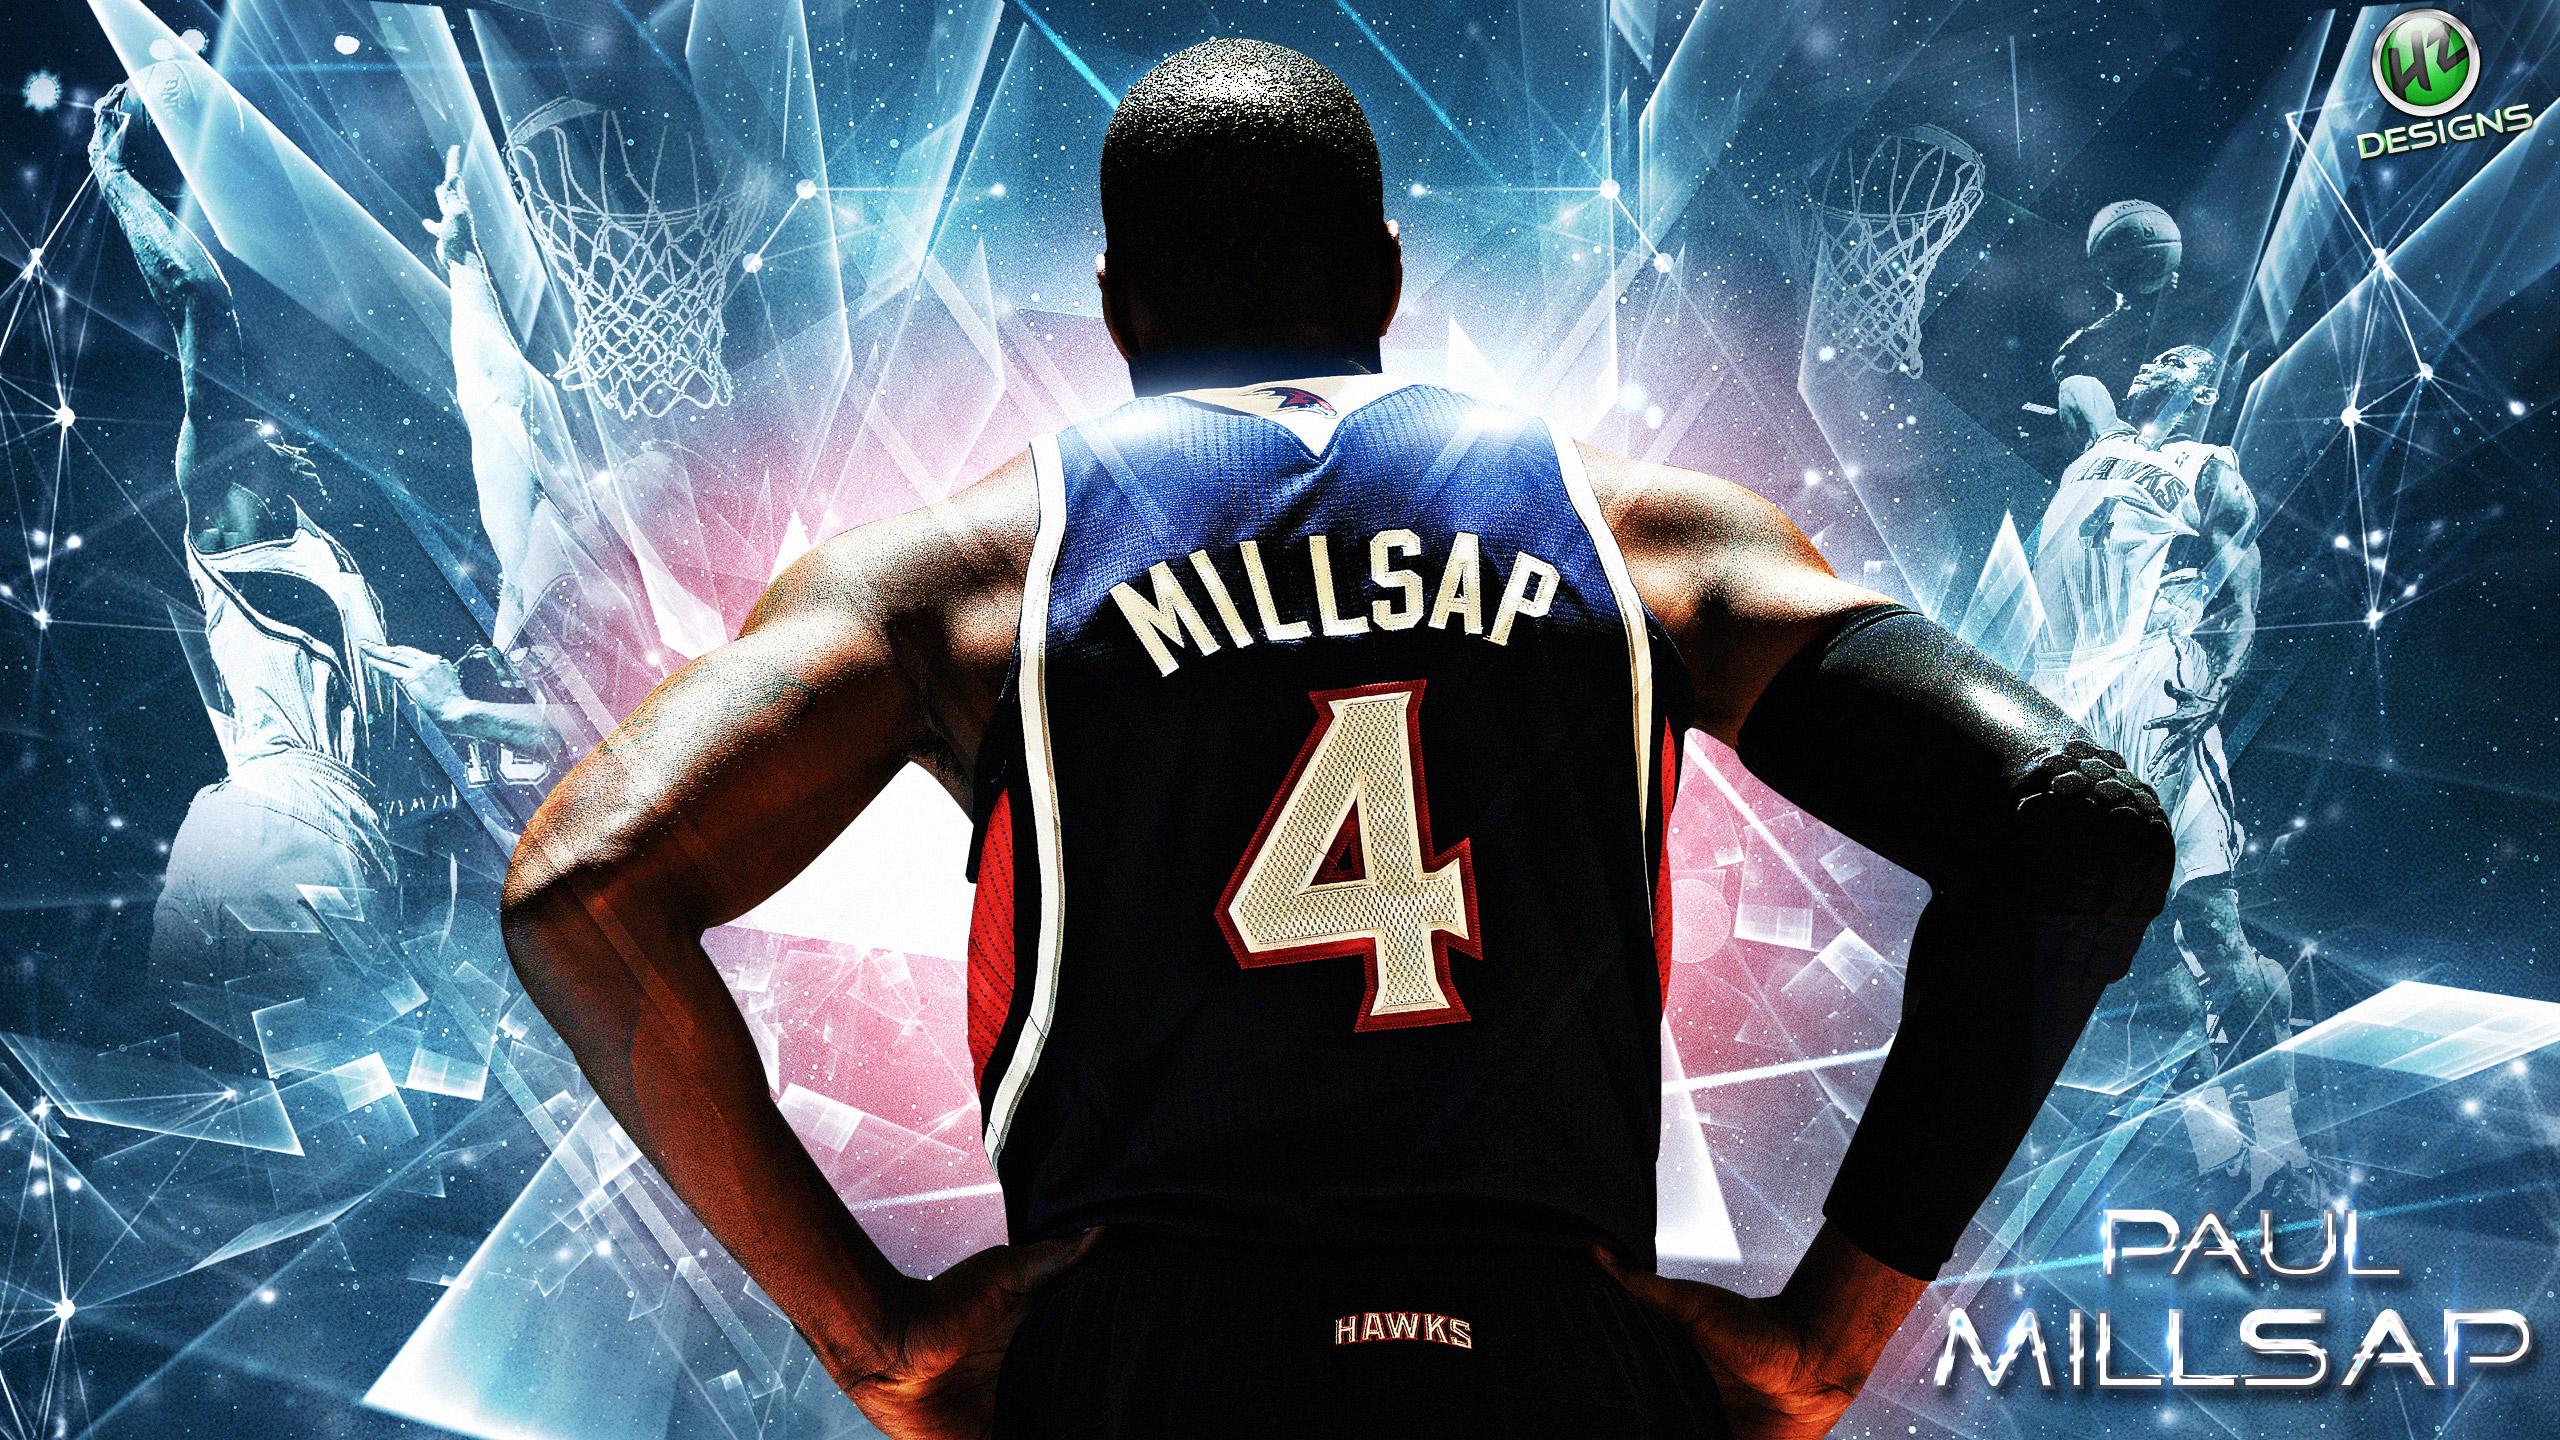 Paul Millsap Hawks Playoffs 2014 Wallpaper 2560x1440